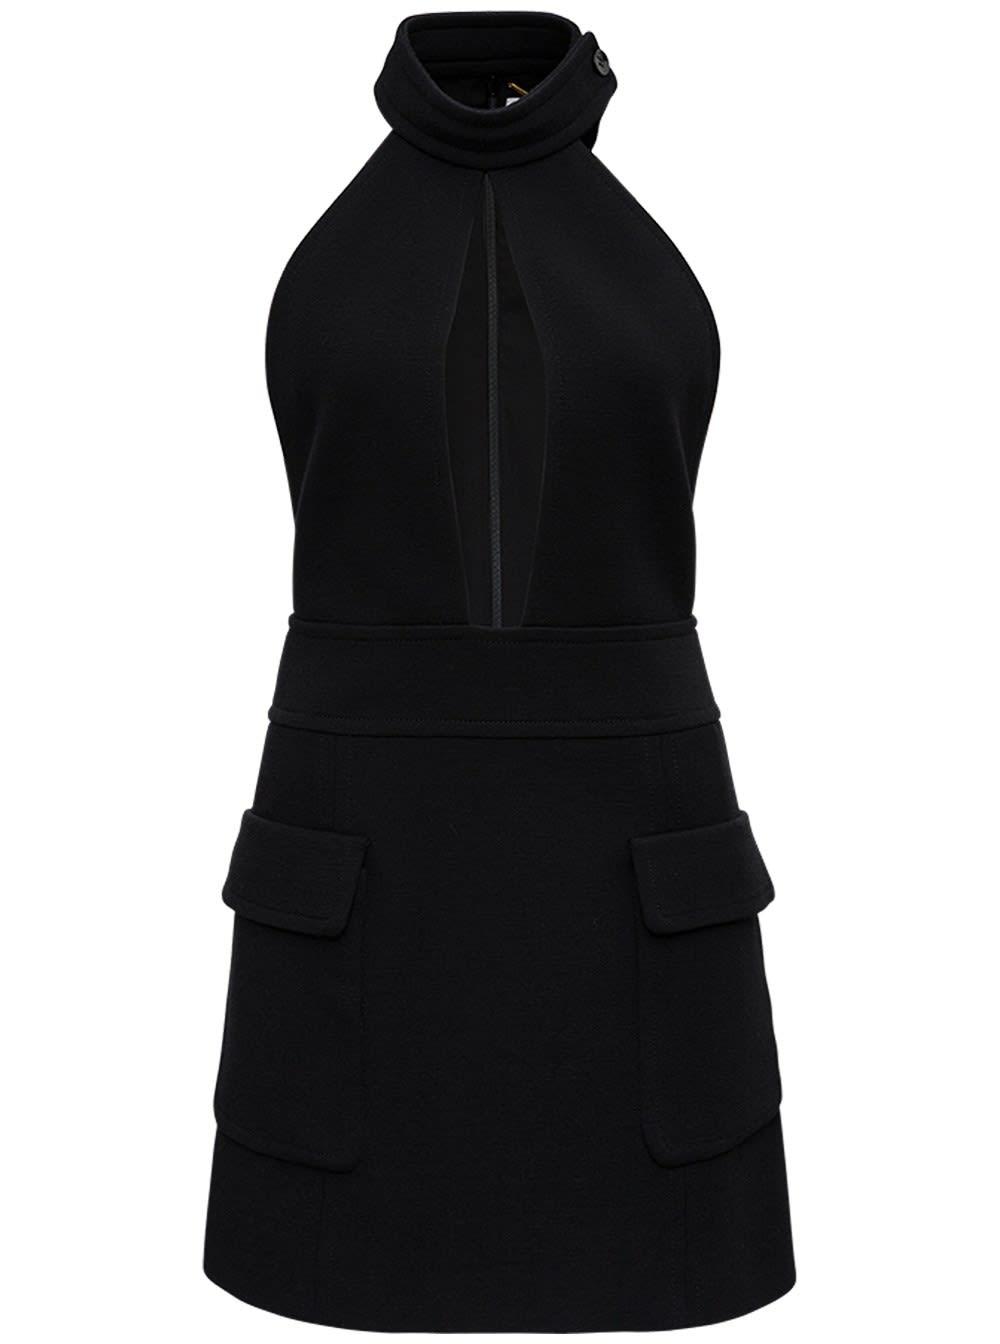 Buy Saint Laurent Wool Dress With Wide Neckline online, shop Saint Laurent with free shipping